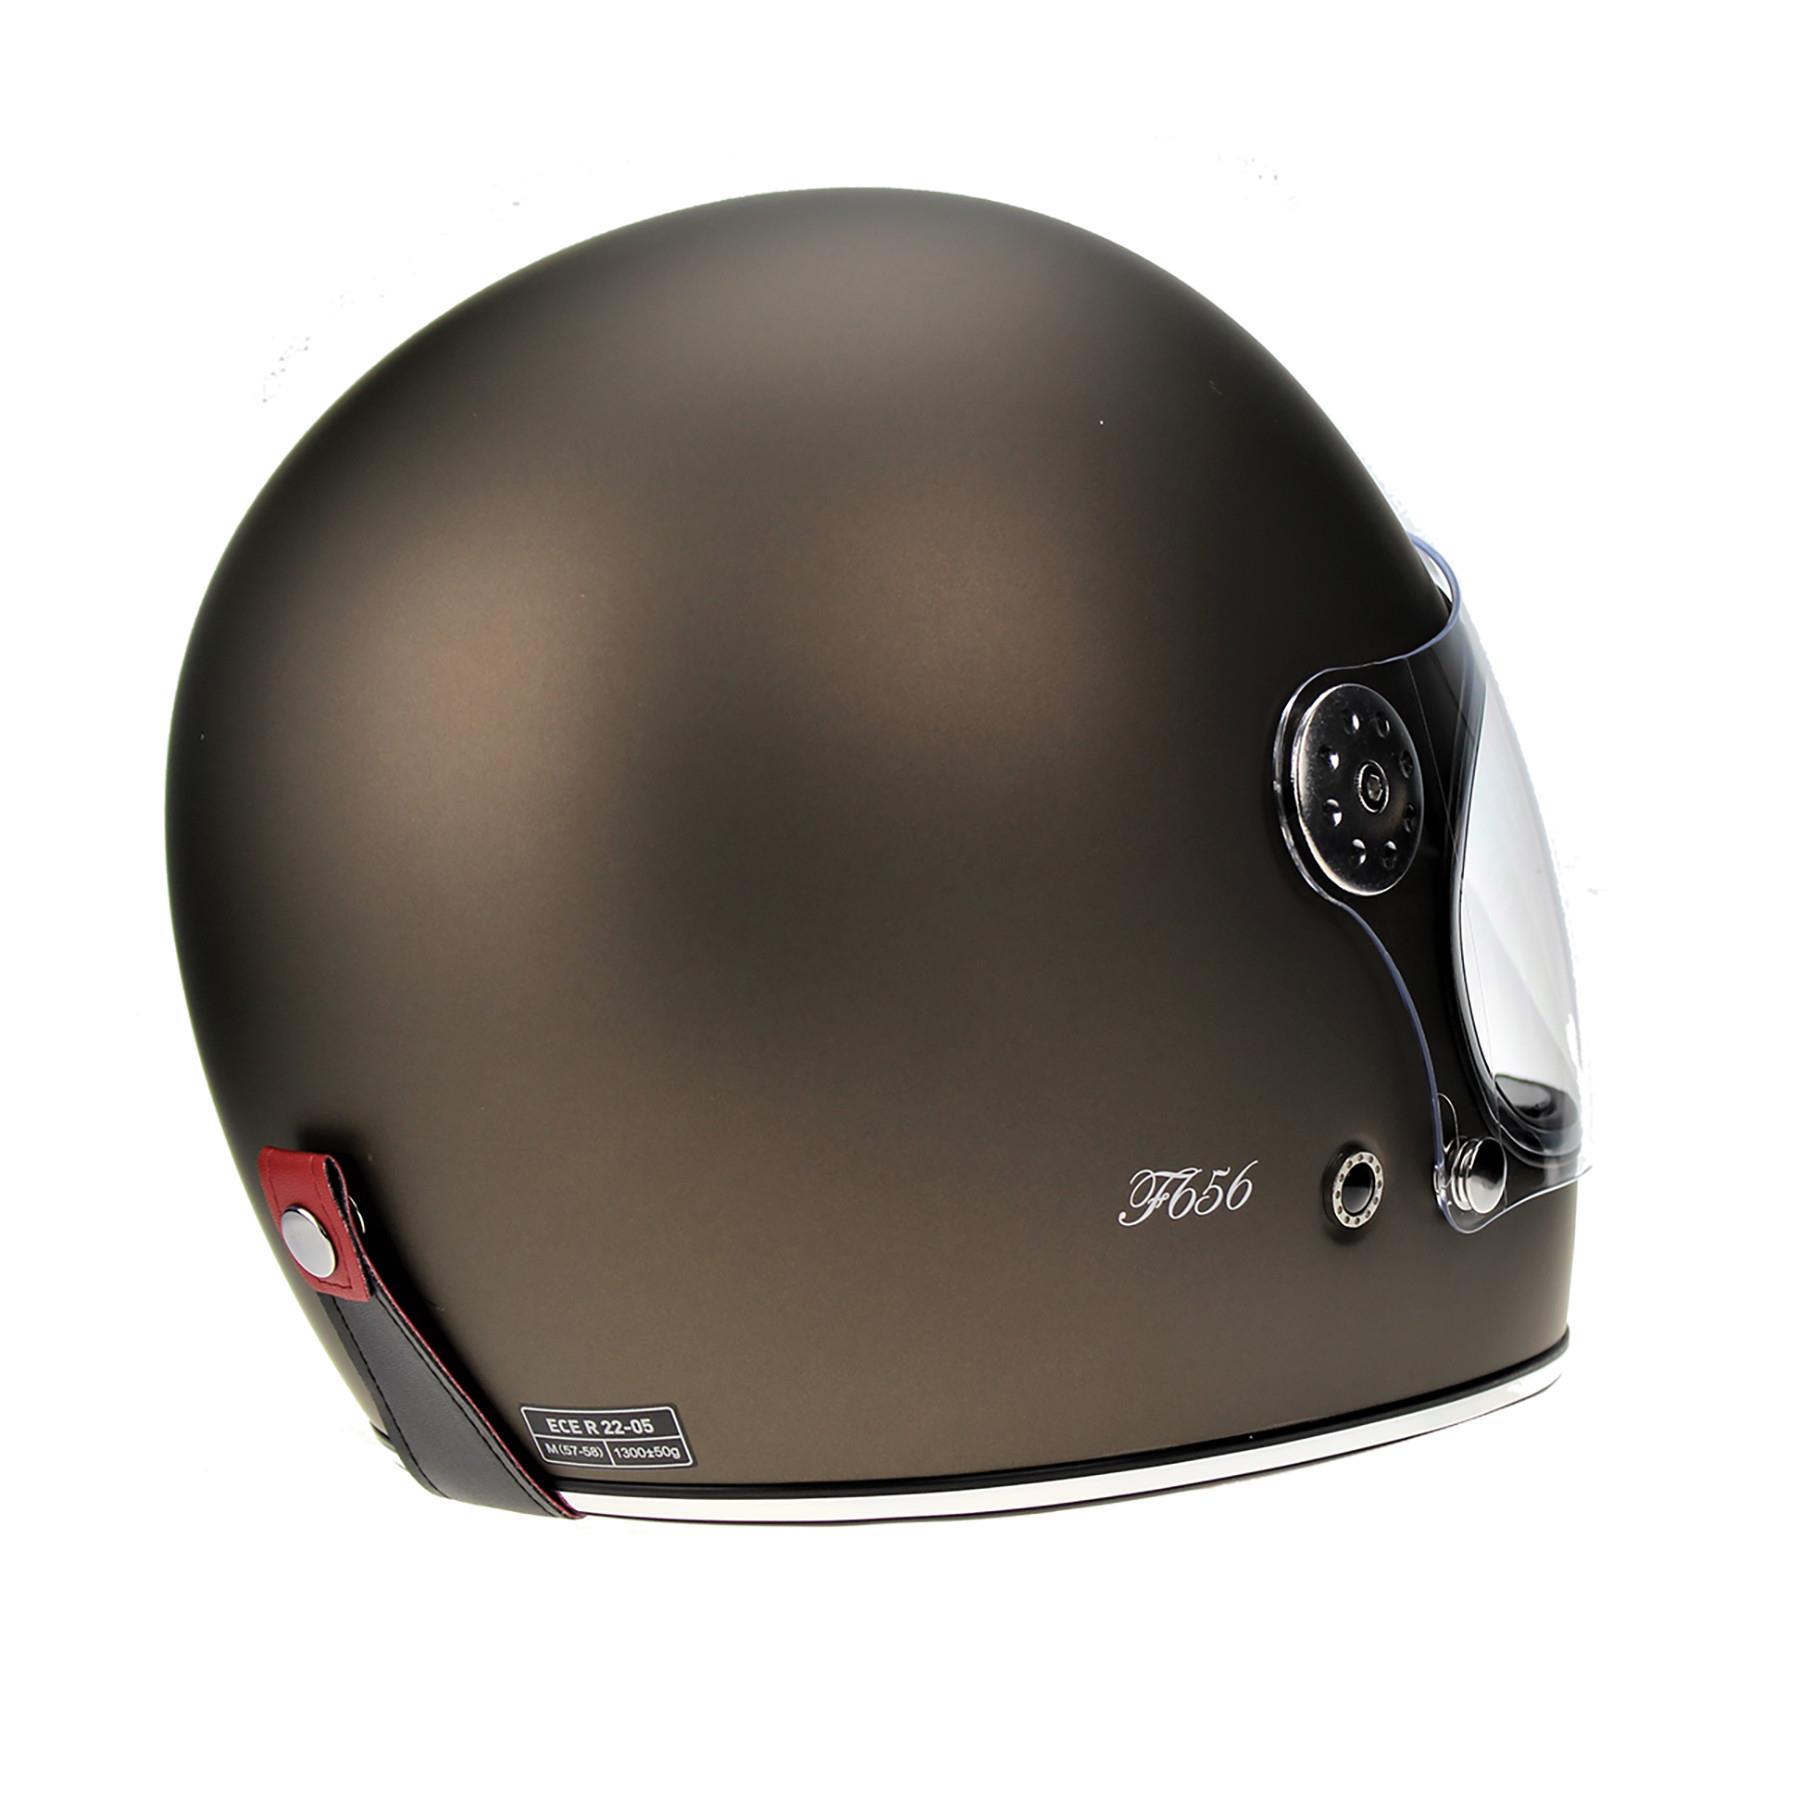 Viper-F656-Retro-Vintage-FibreGlass-Full-Face-Motorcycle-Bike-Road-Crash-Helmet miniature 26